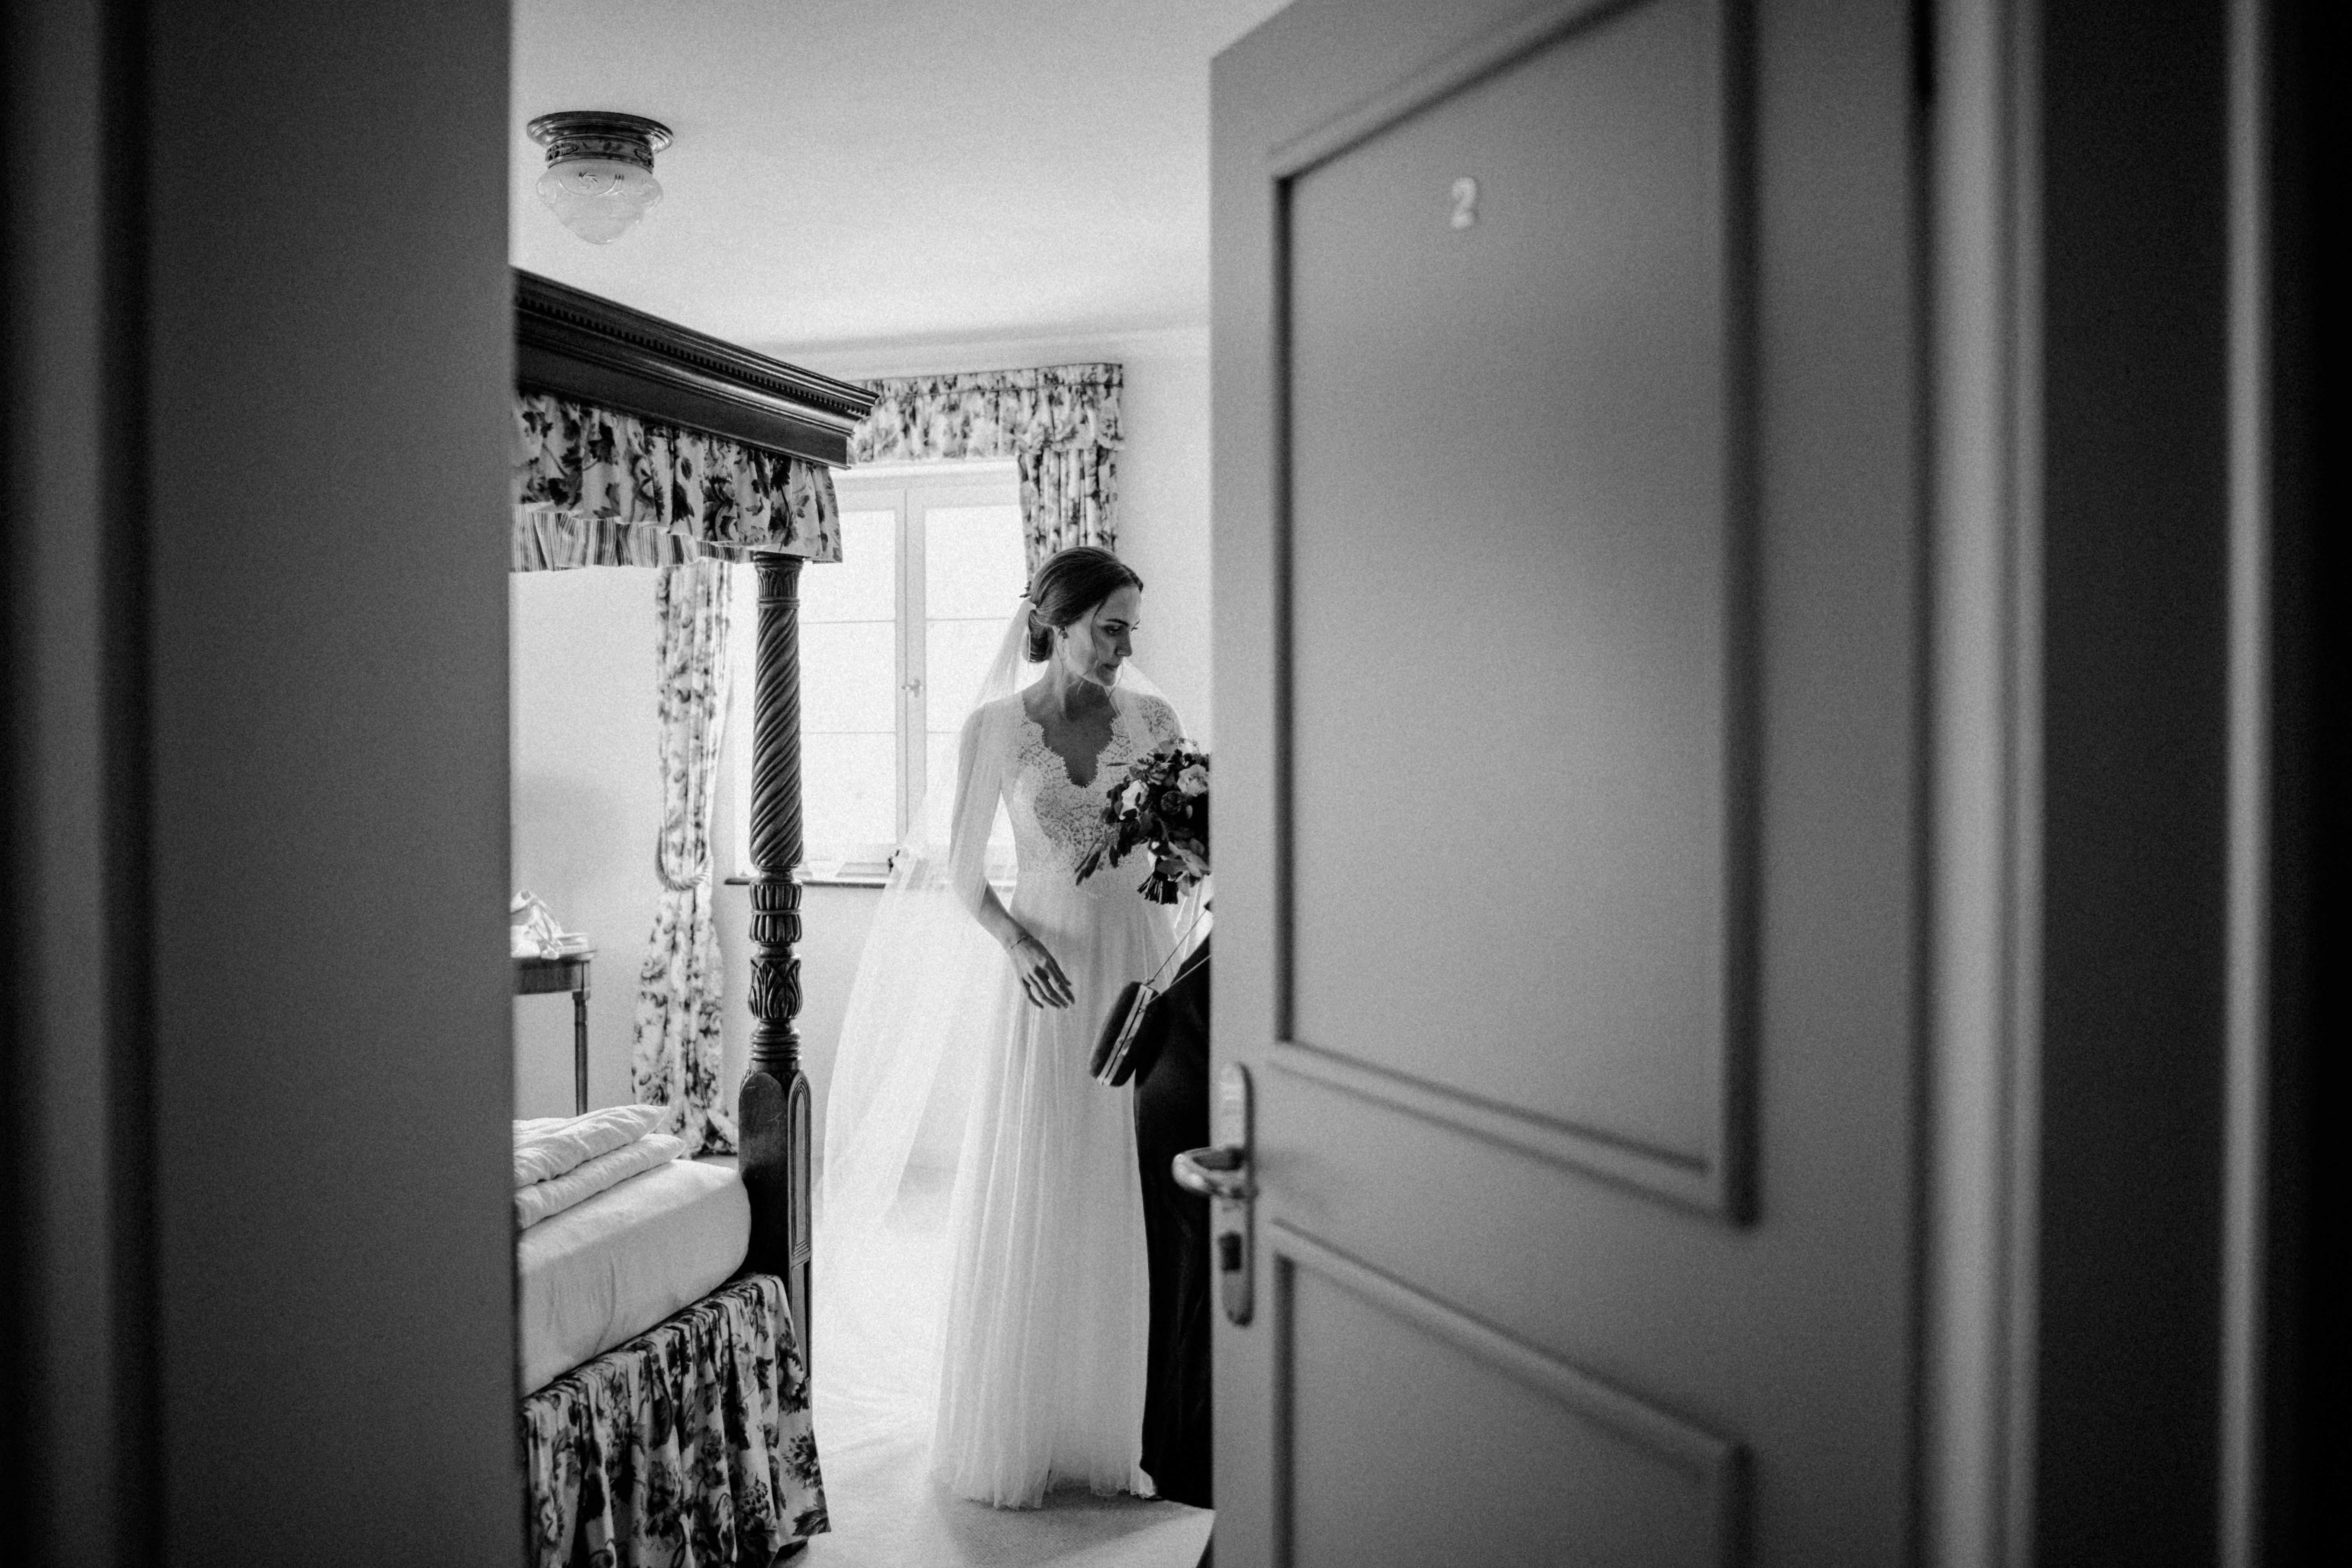 ready abfahrt sonja poehlmann photography couples muenchen bayern